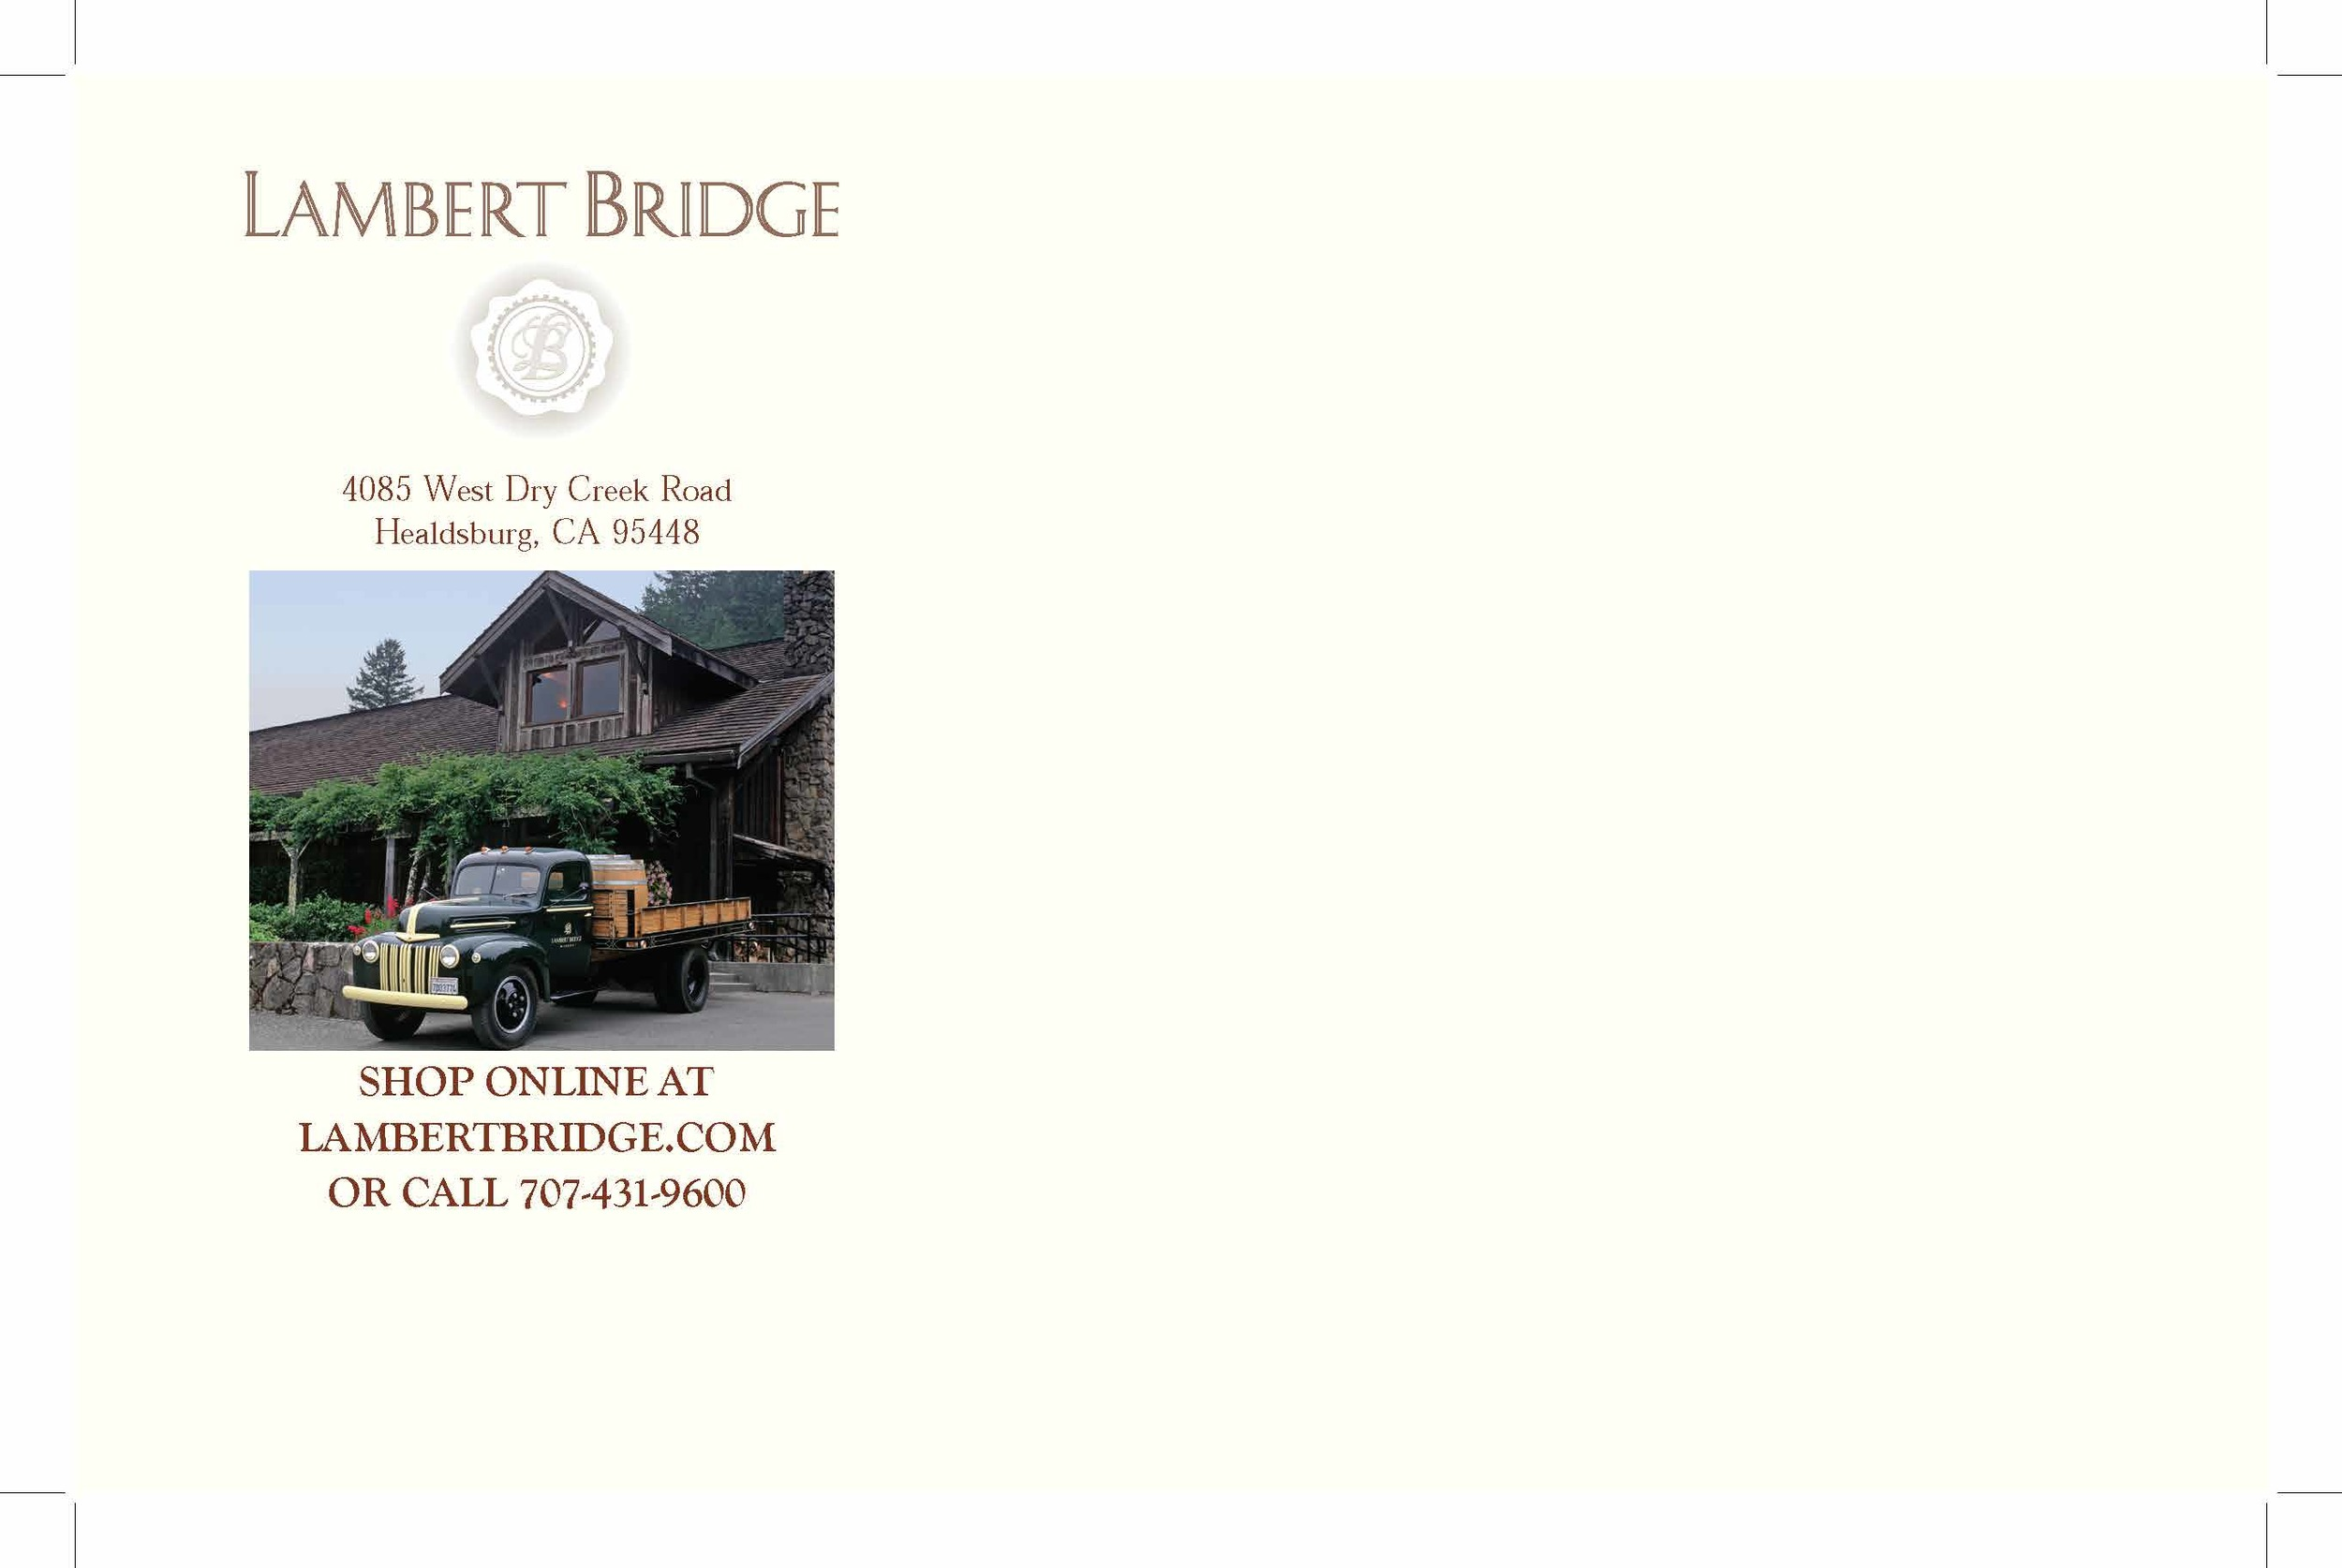 LambertBridge-Catalog2014-Final_Page_8.jpg